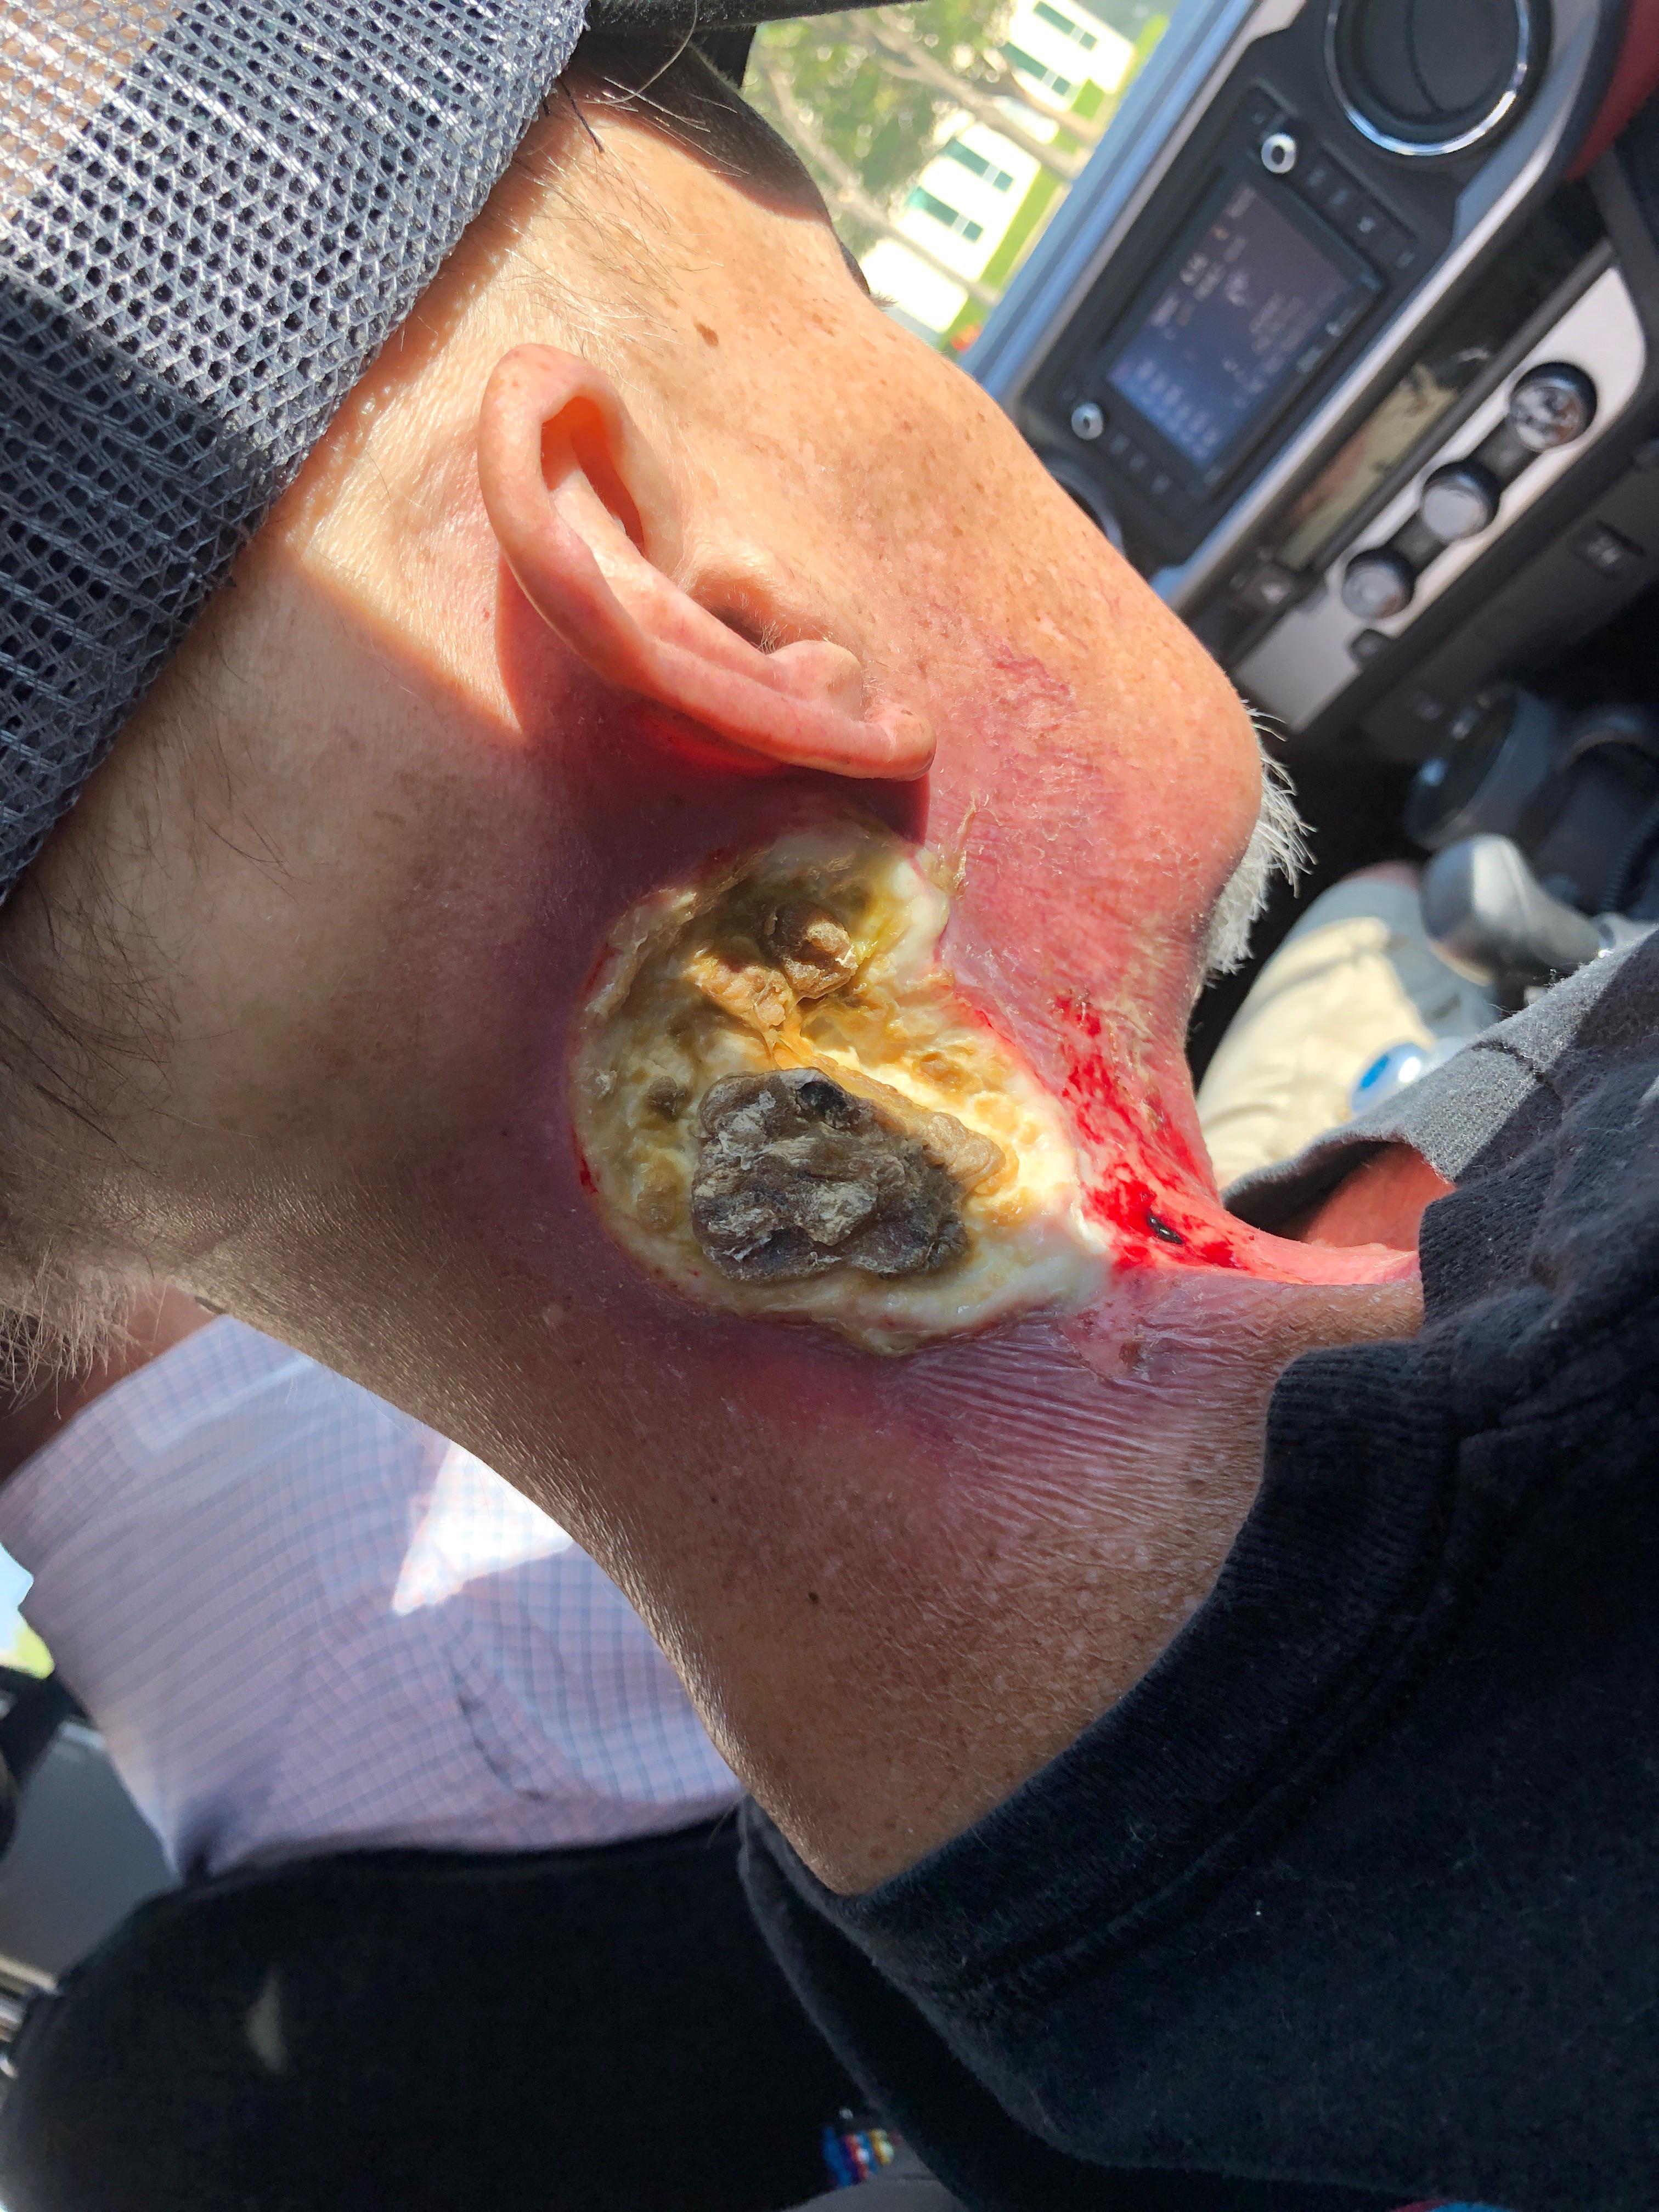 yeast infection and vestibular papillomatosis